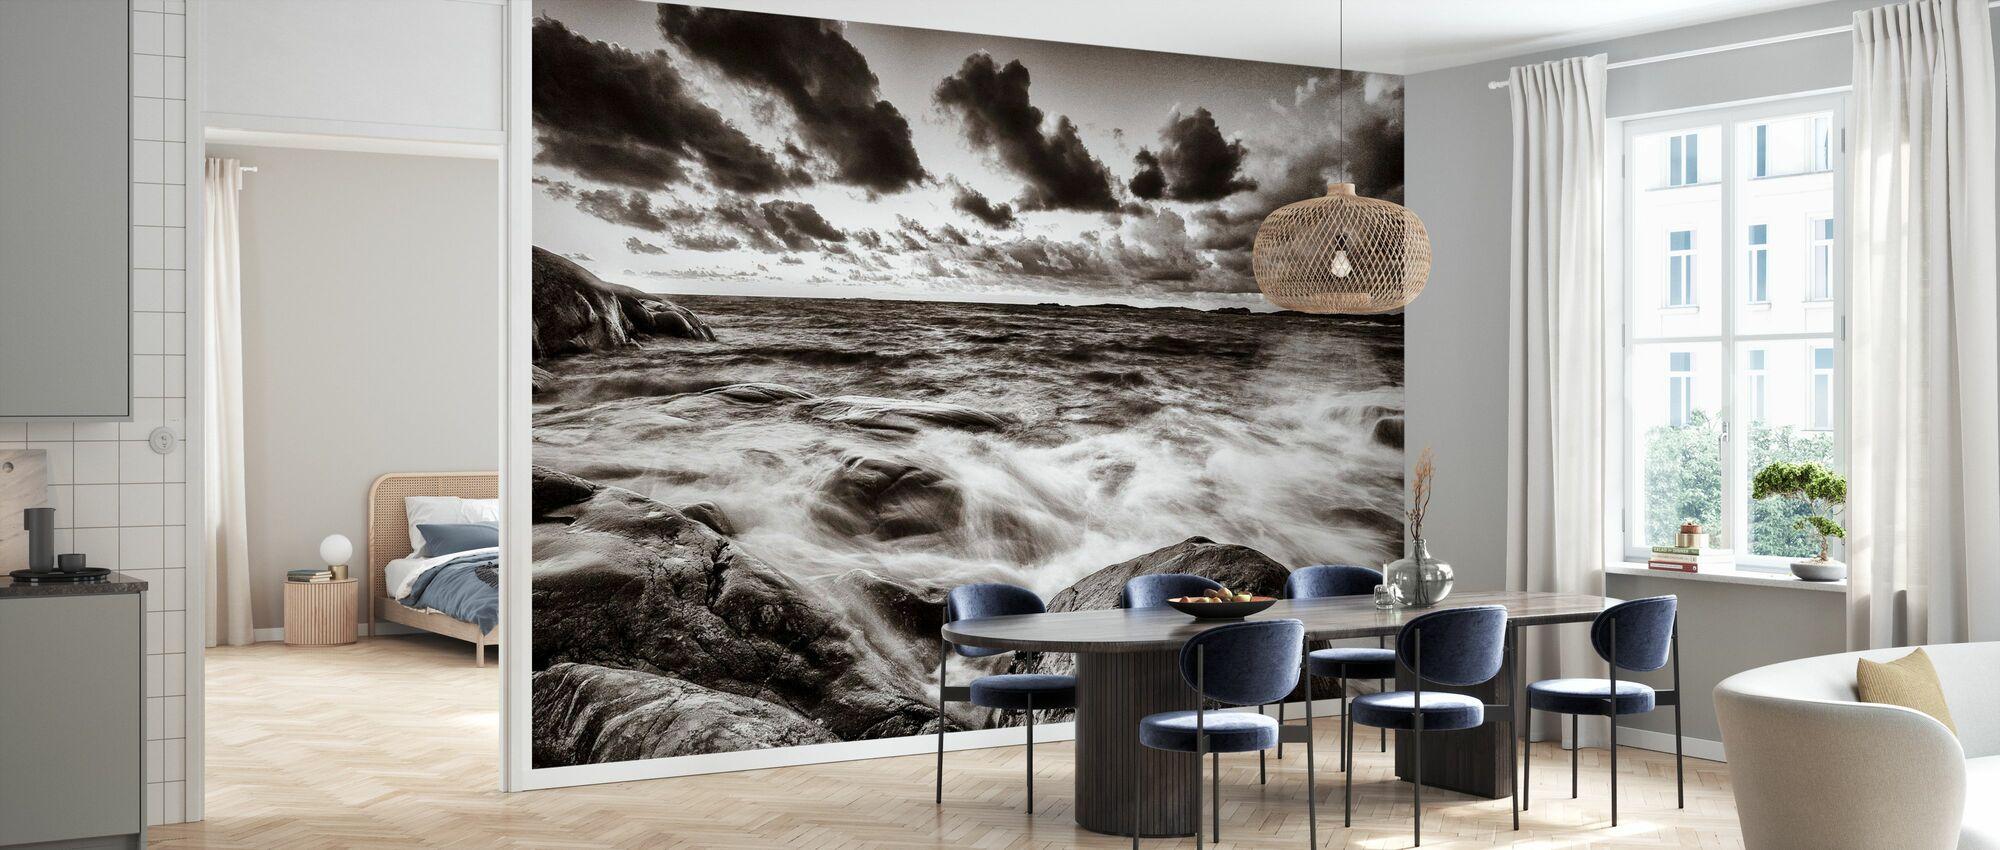 Stormy Sea at Rocks - Wallpaper - Kitchen